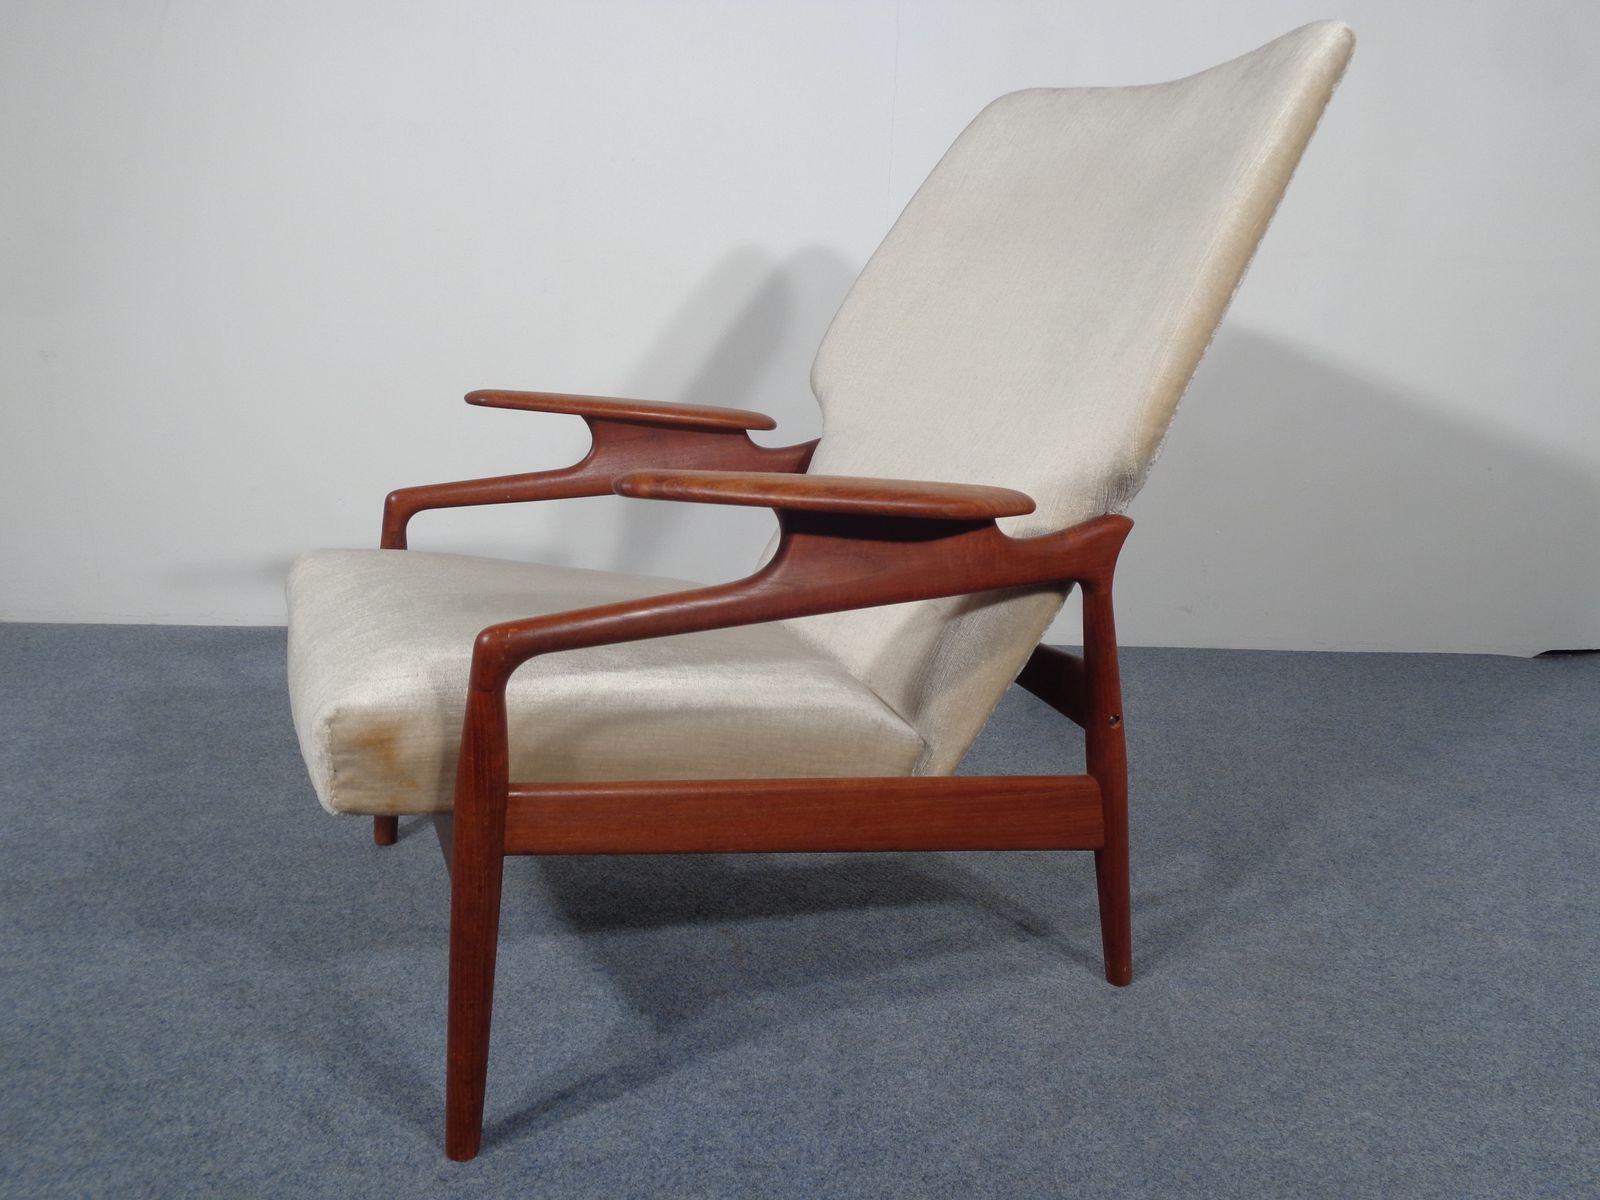 Vintage Danish Adjustable Teak Lounge Chair for sale at Pamono